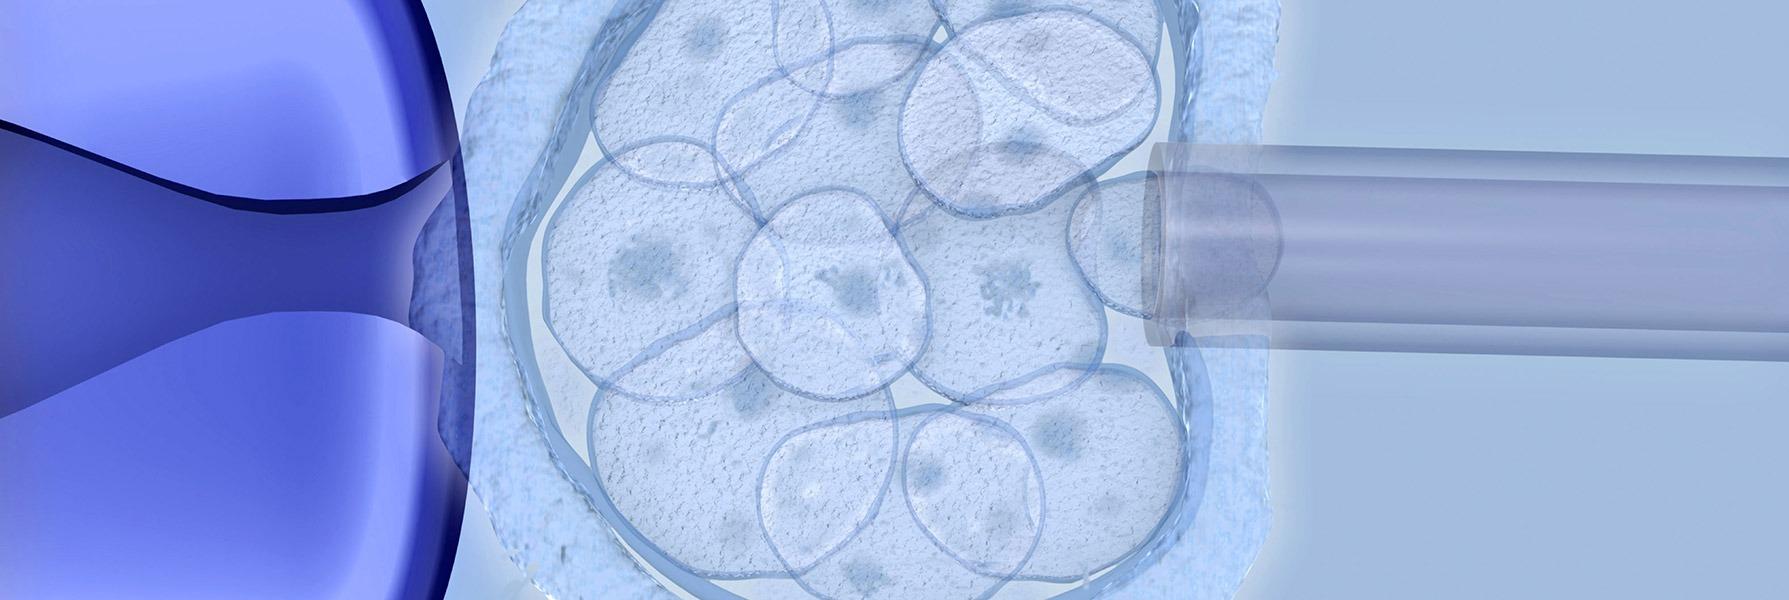 ivf and preimplantation genetic diagnosis essay